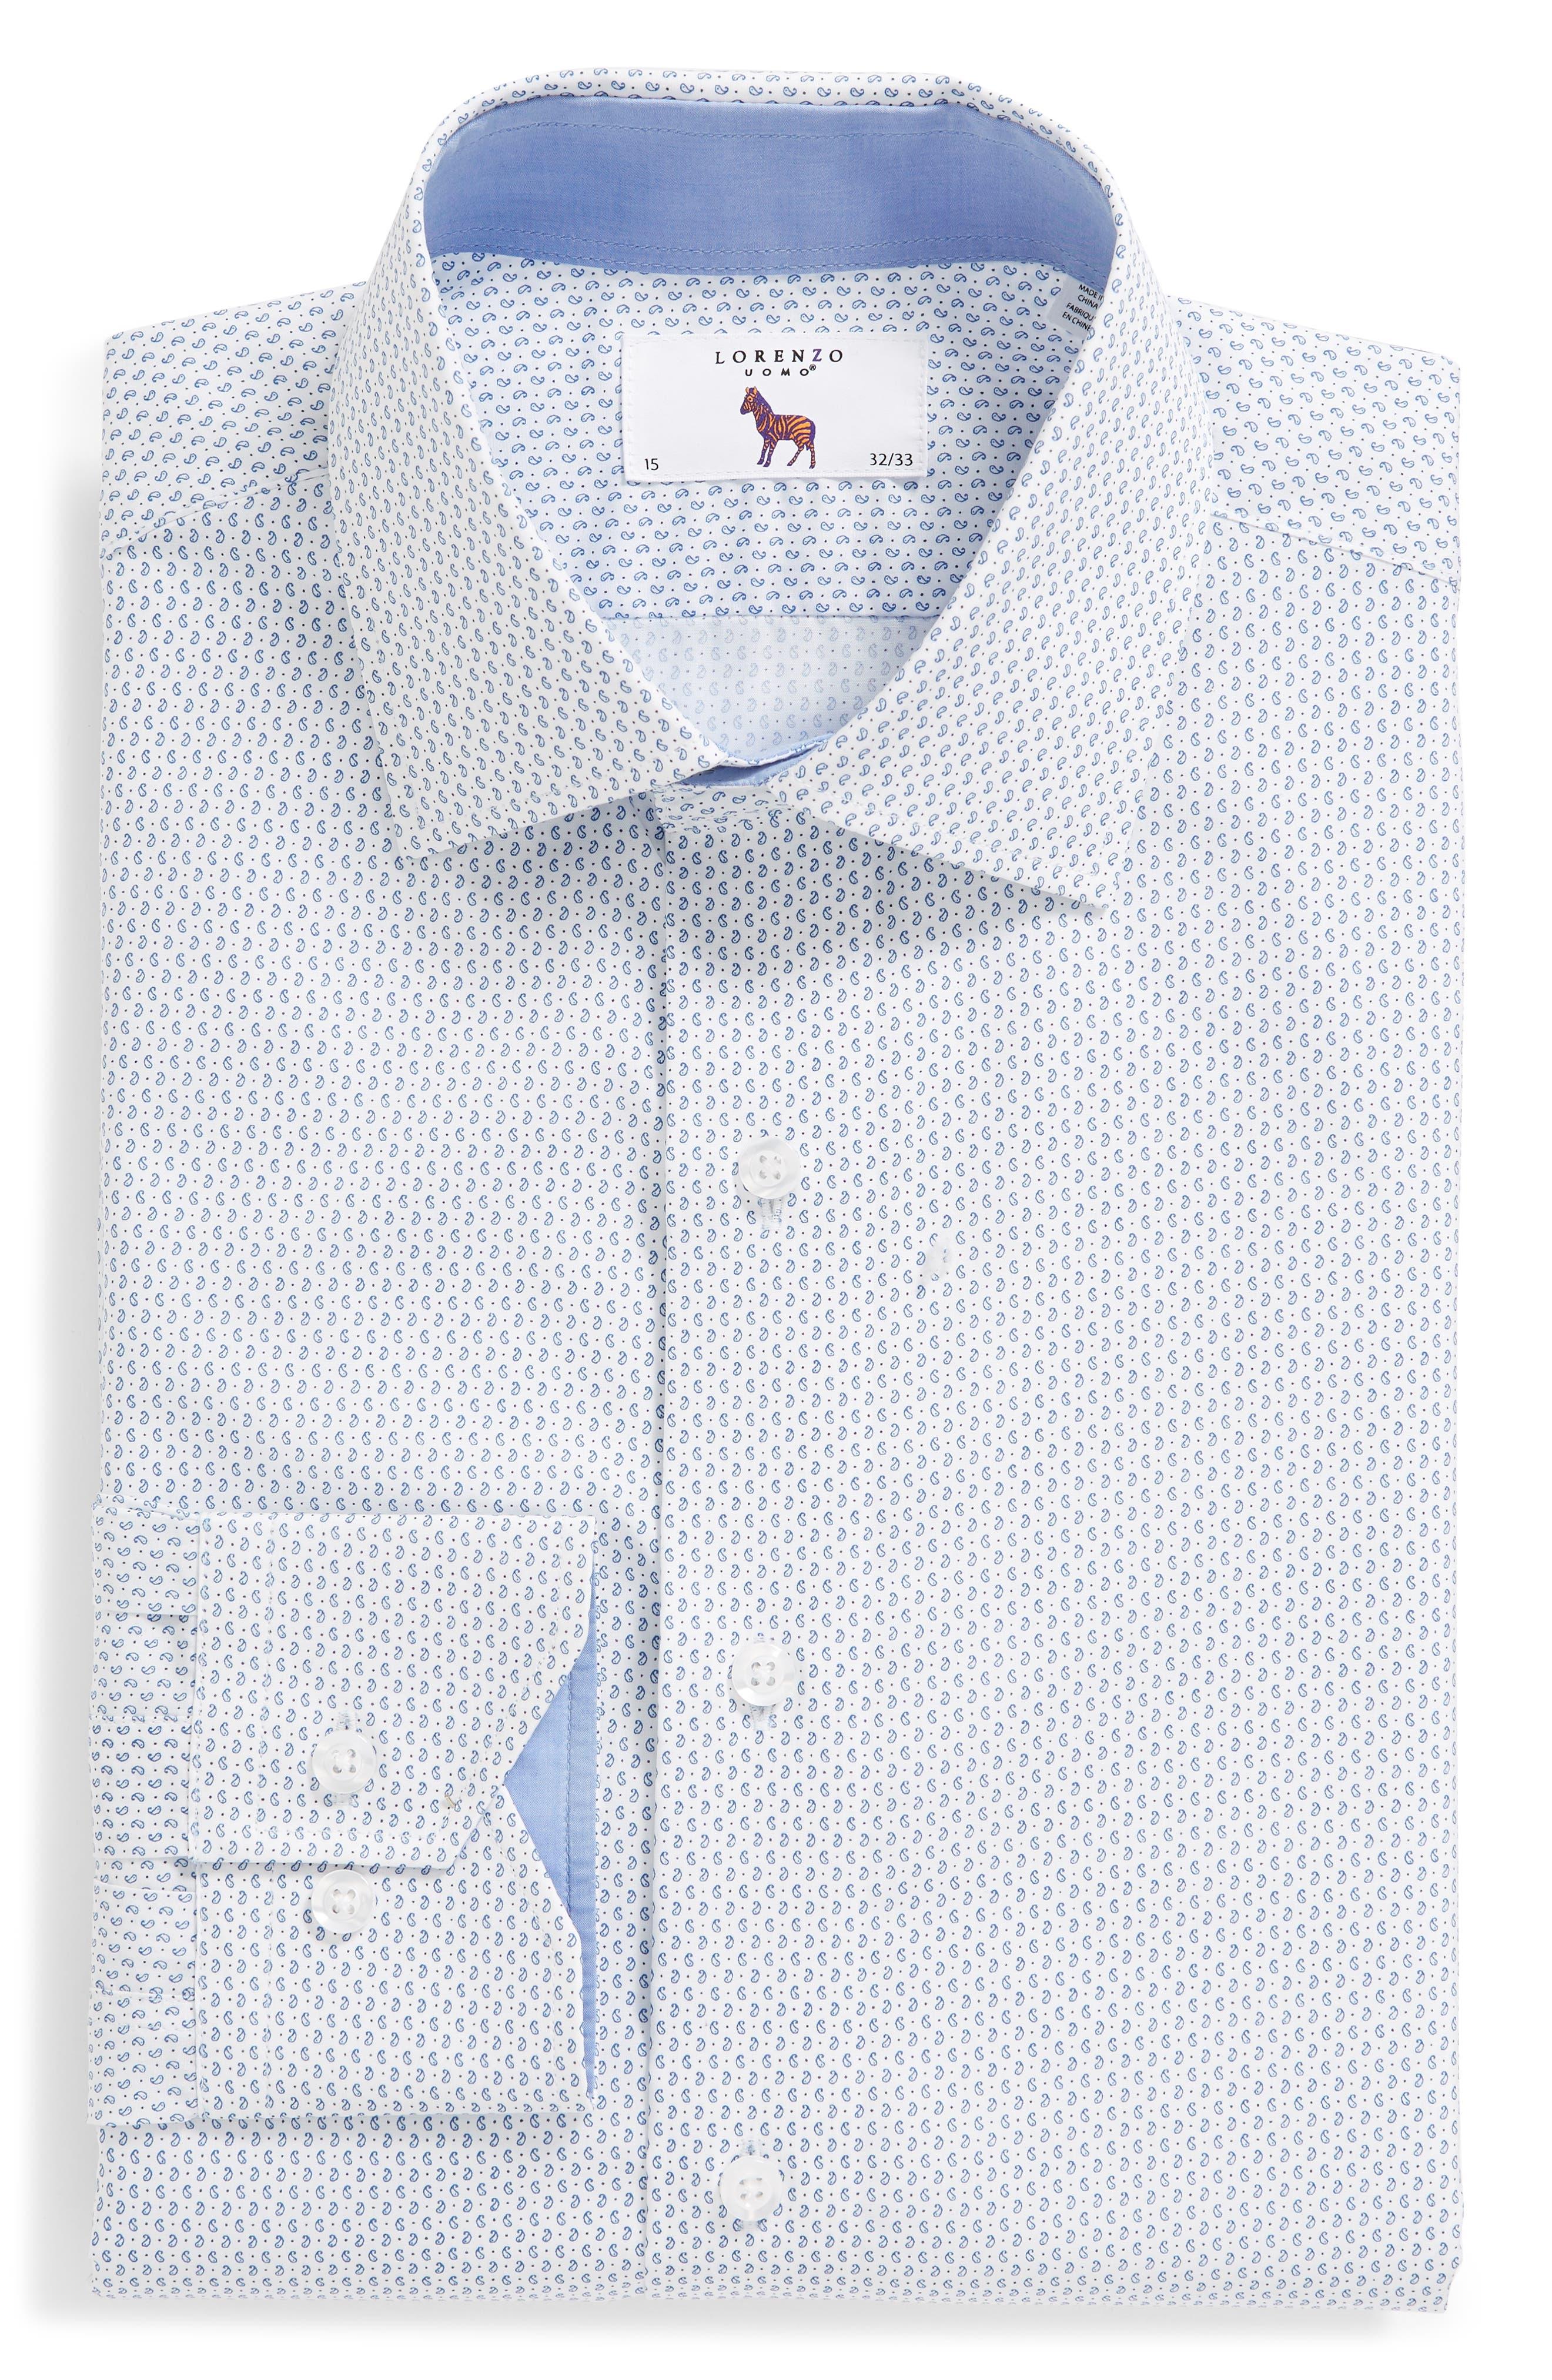 LORENZO UOMO,                             Trim Fit Paisley Dress Shirt,                             Alternate thumbnail 5, color,                             400